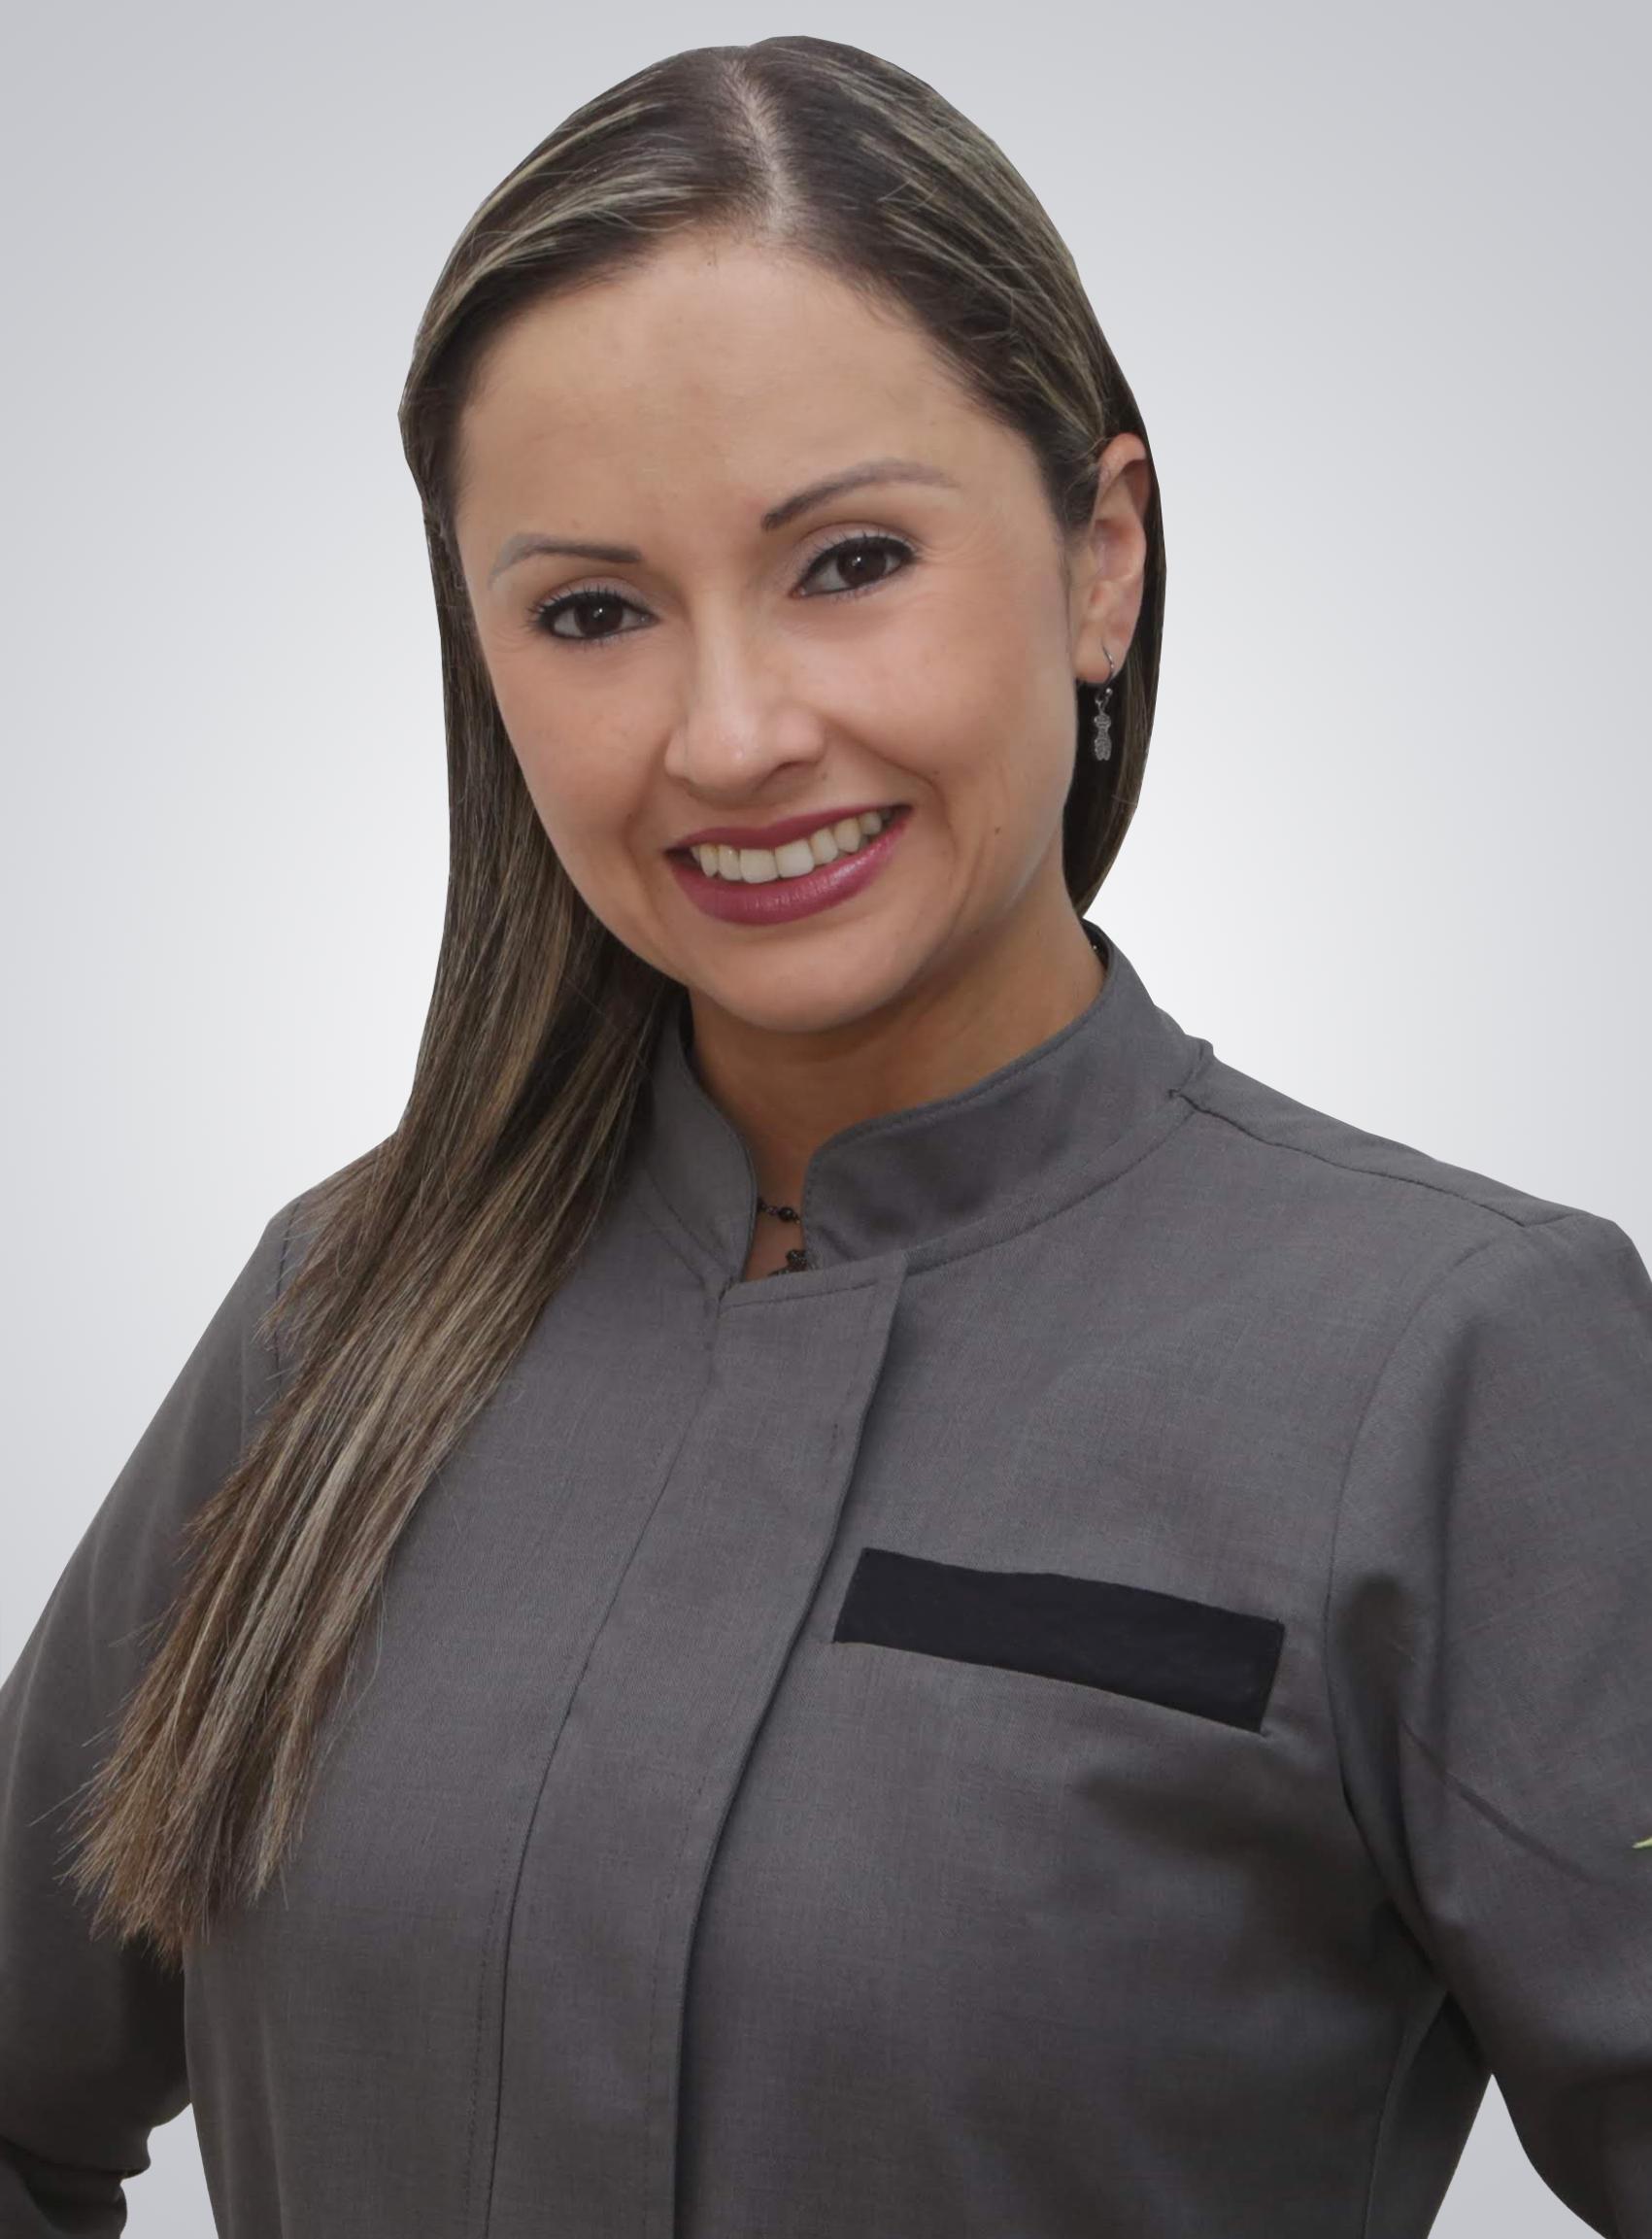 Dra. Biviana Carolina Gutierrez Alvarez